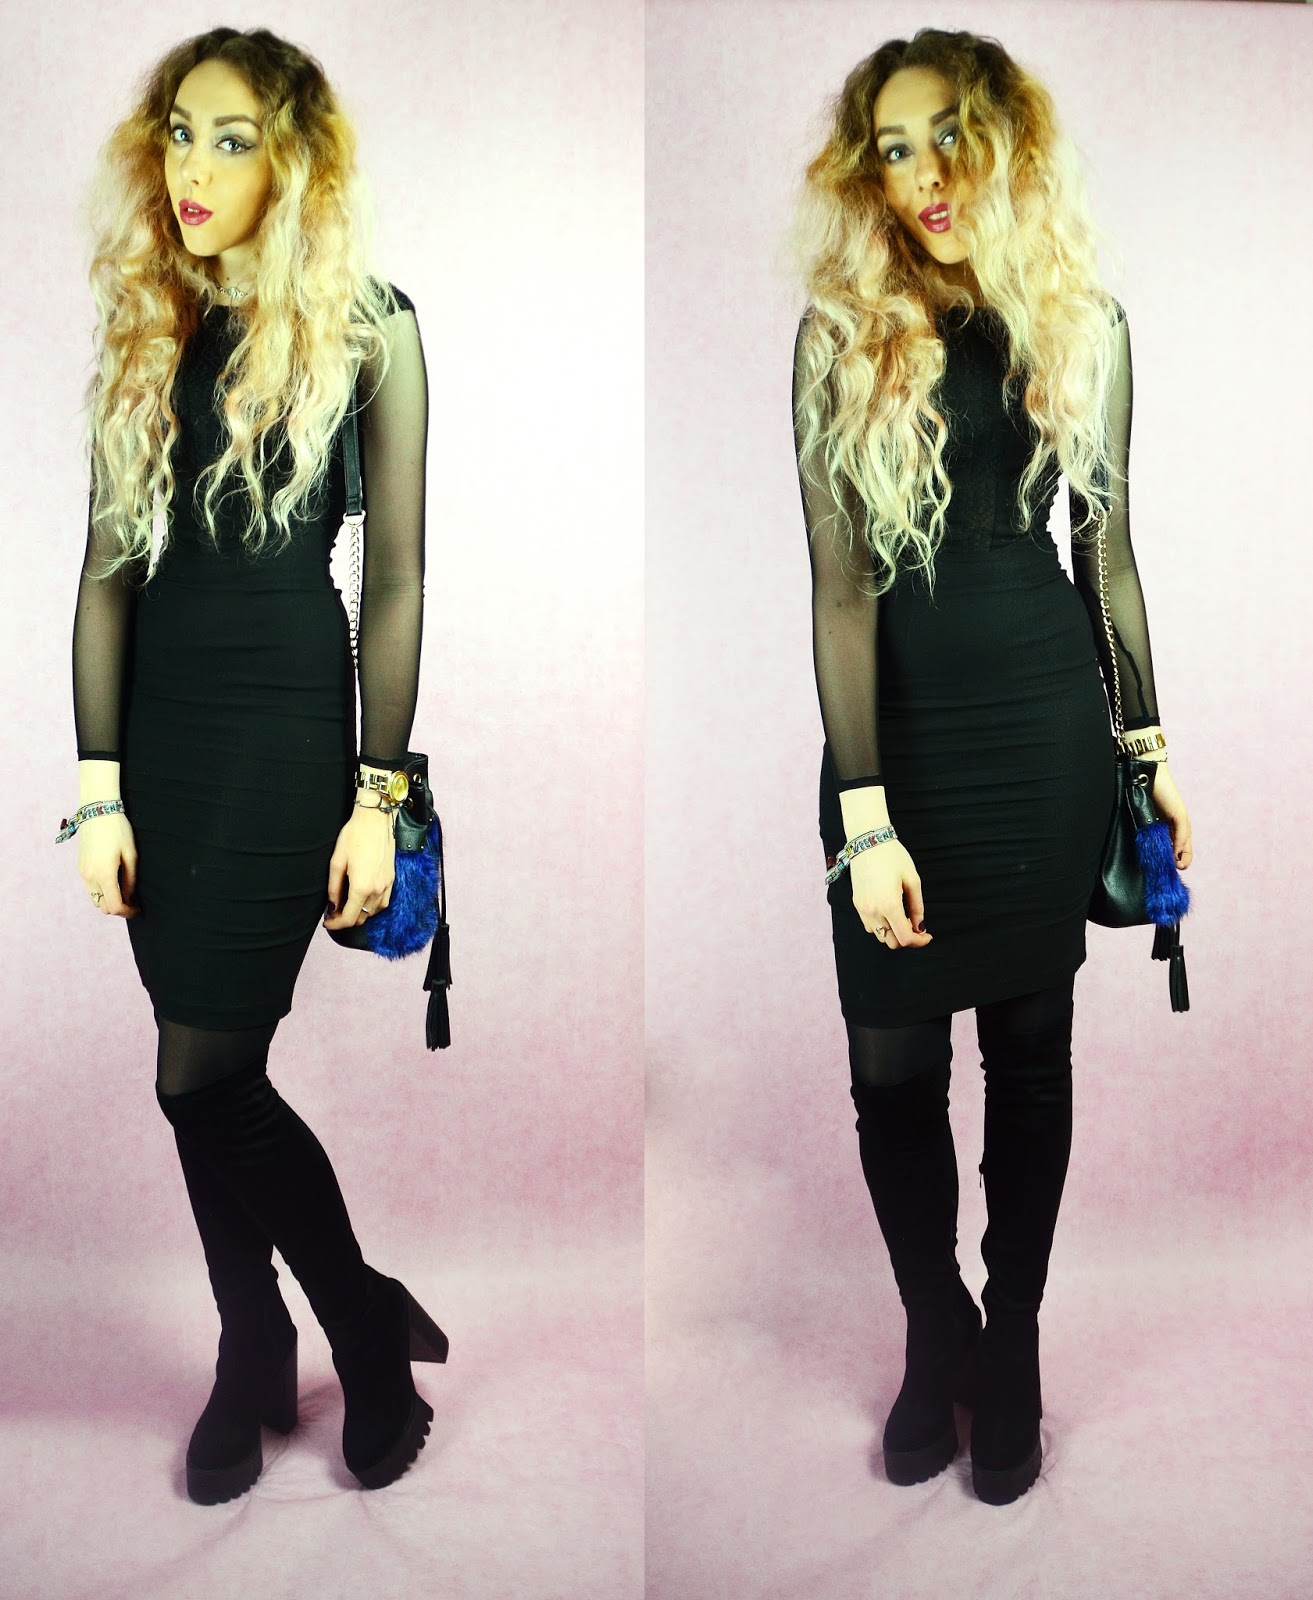 Valentines Day, Hybrid Haeley Mesh Sleeve Dress with Lace Detail Black, Stephi LaReine, UK Lifestyle Blog, Thigh High Boots